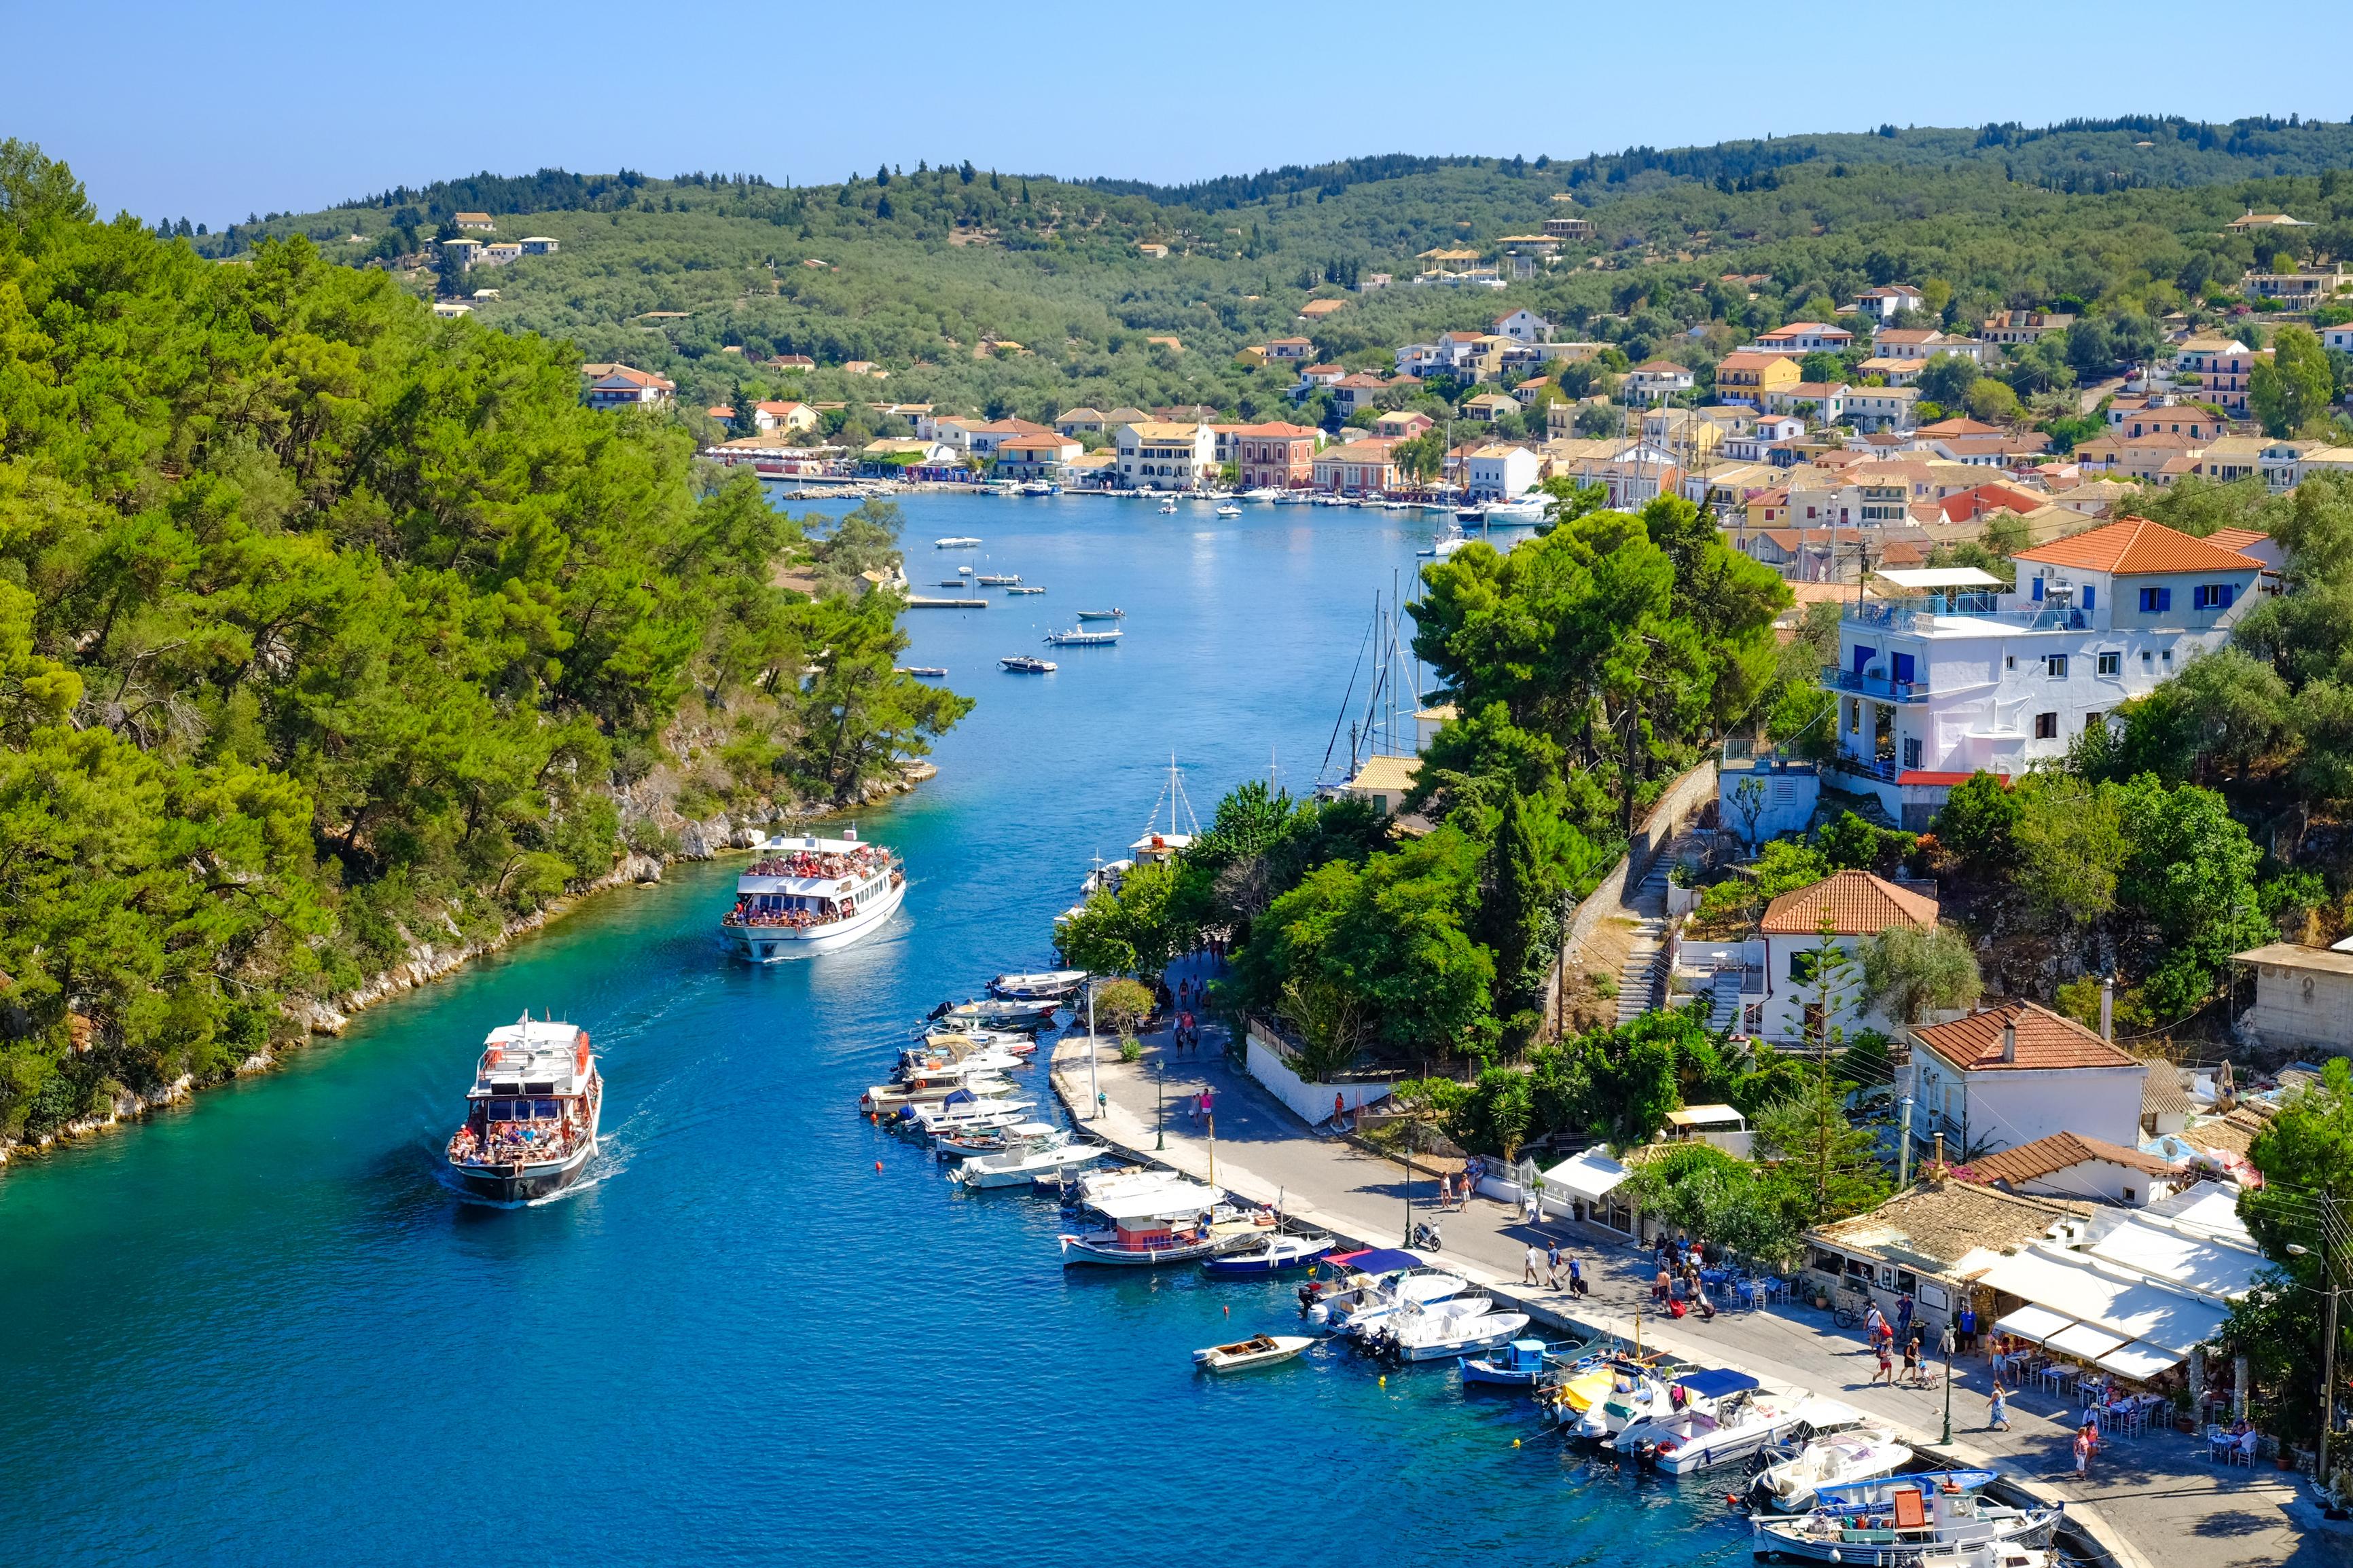 Port in the Greek island of Corfu